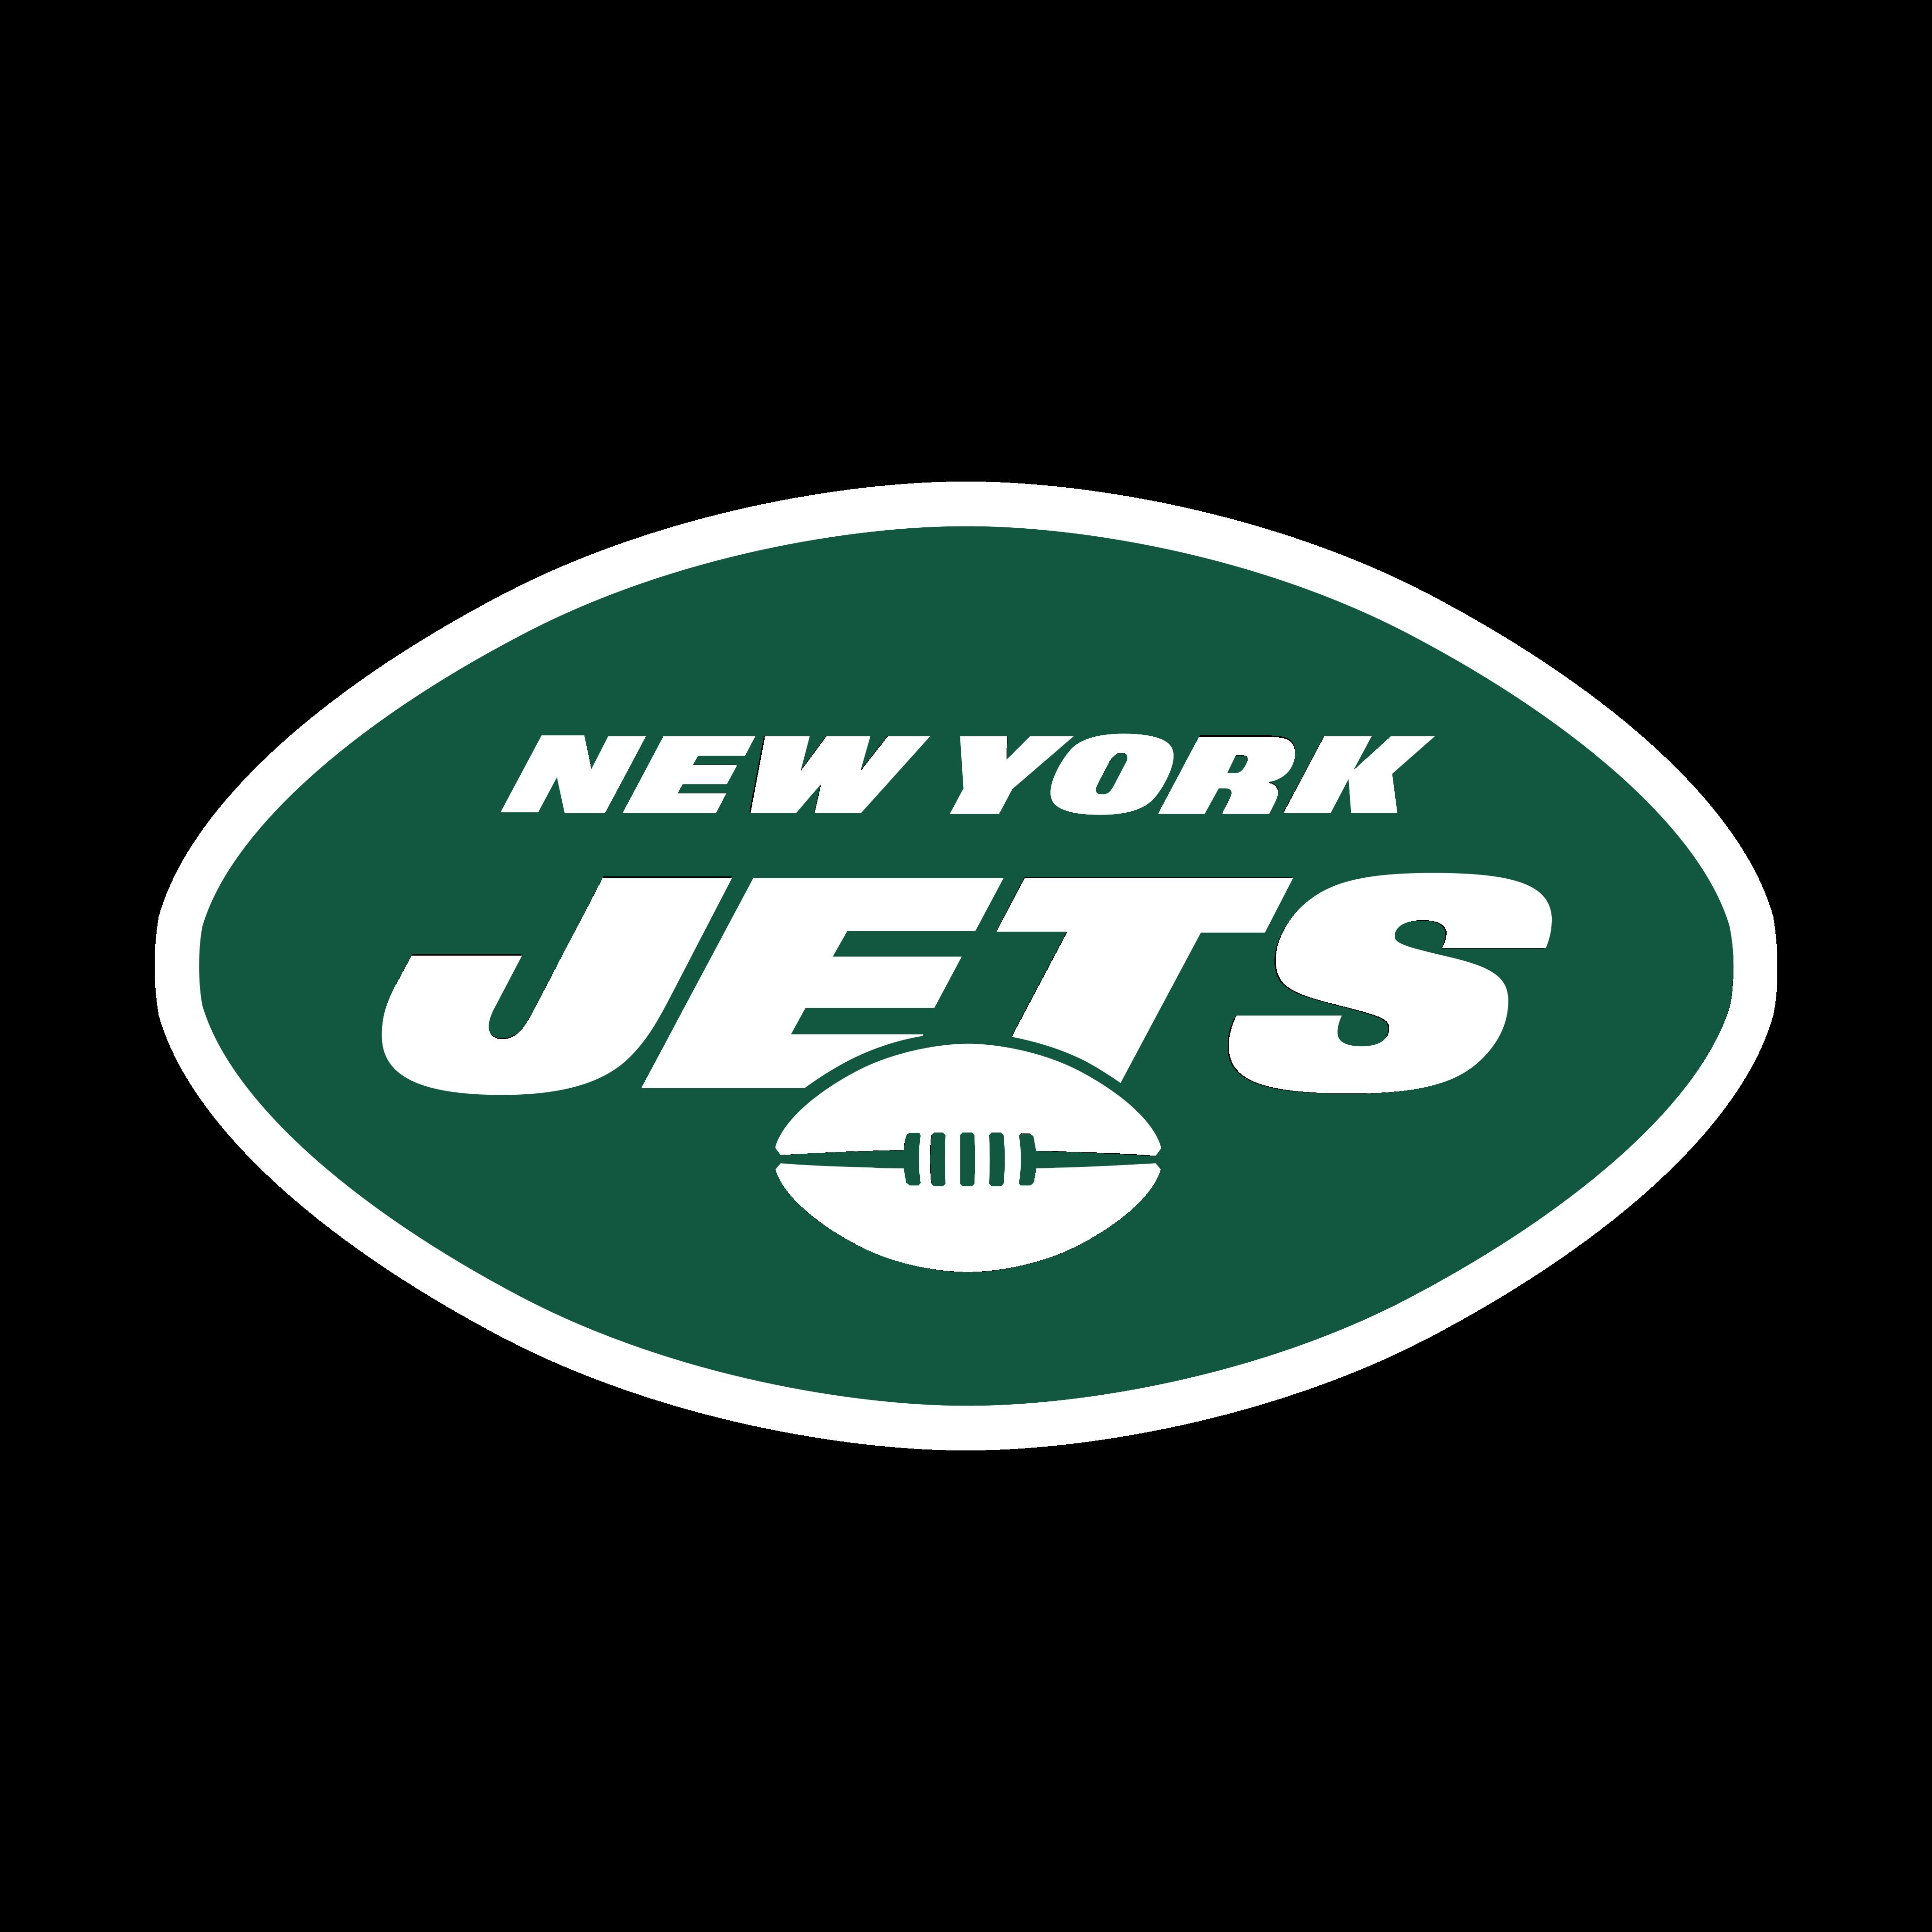 new york jets logo 0 - New York Jets Logo